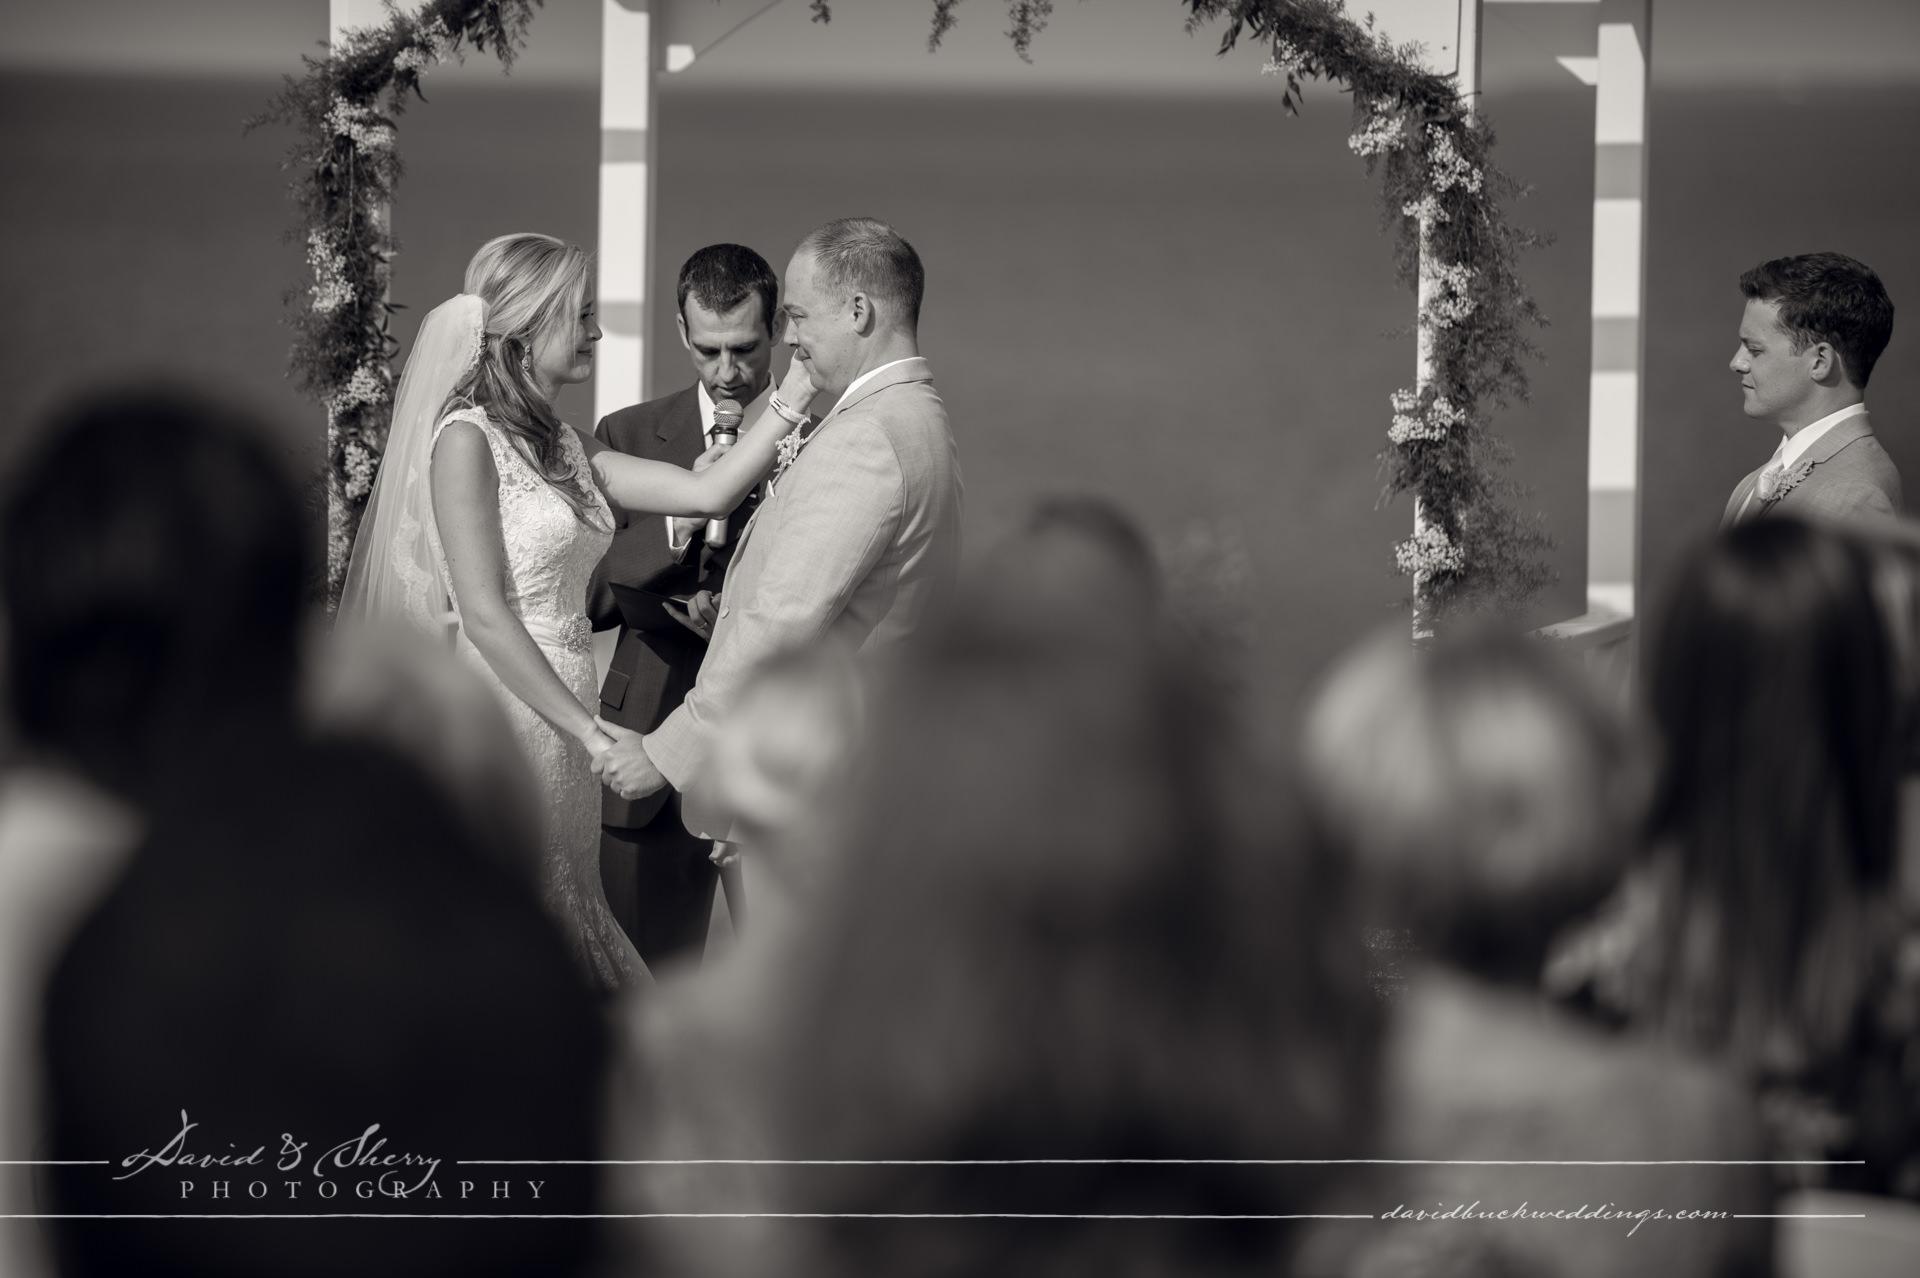 Cobble_Beach_Wedding_Photography_Owen_Sound_26